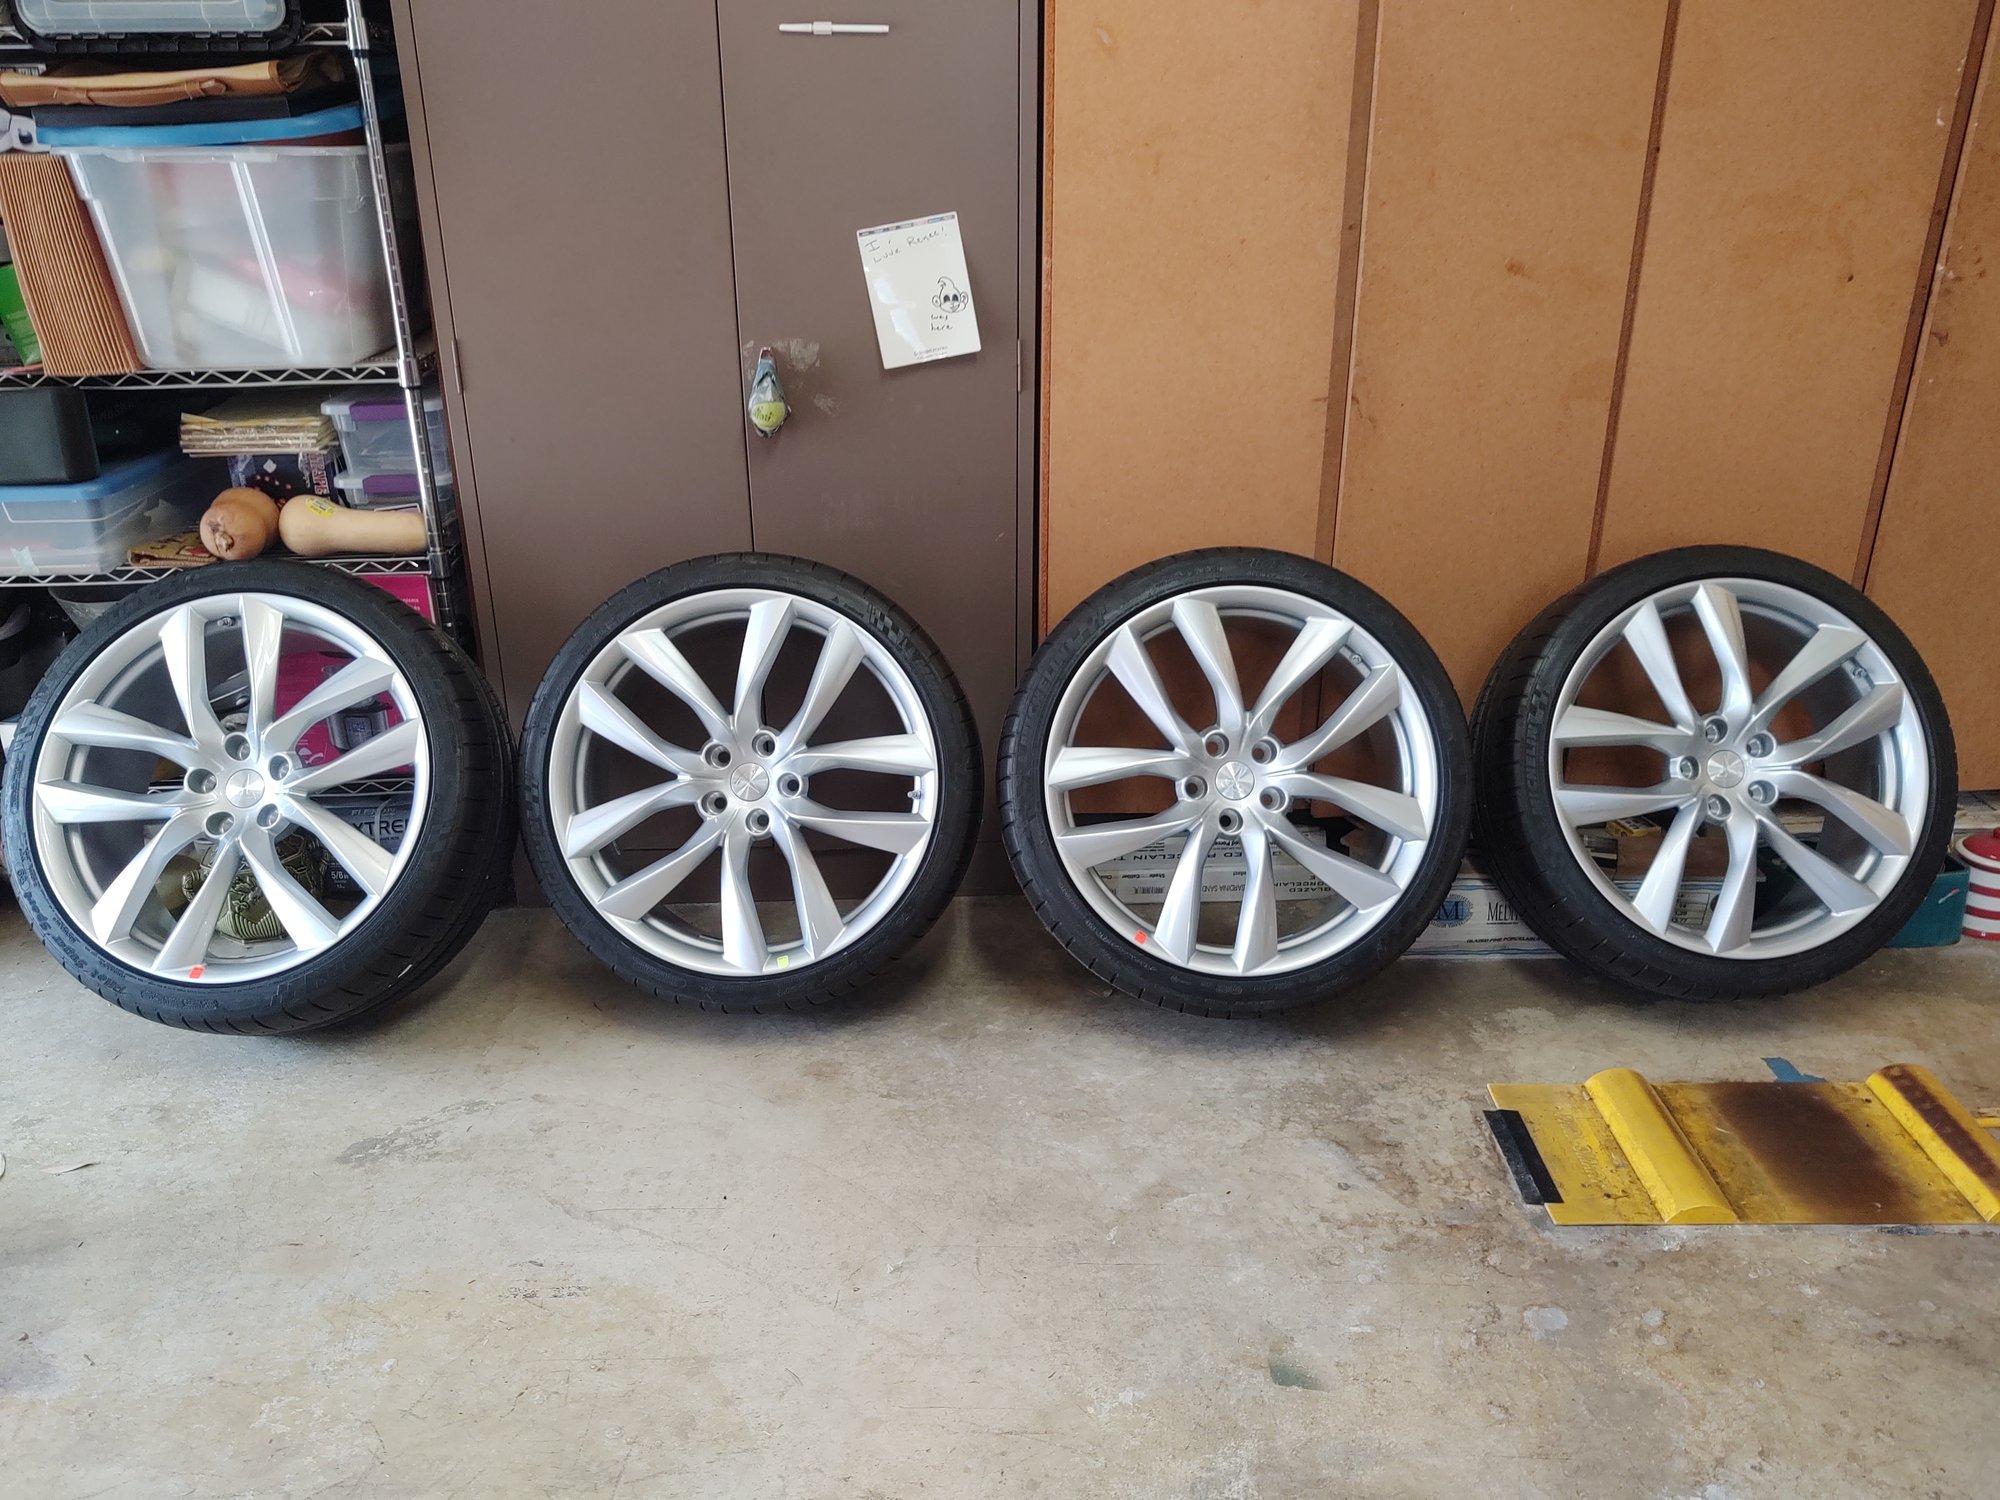 4 wheels.jpg